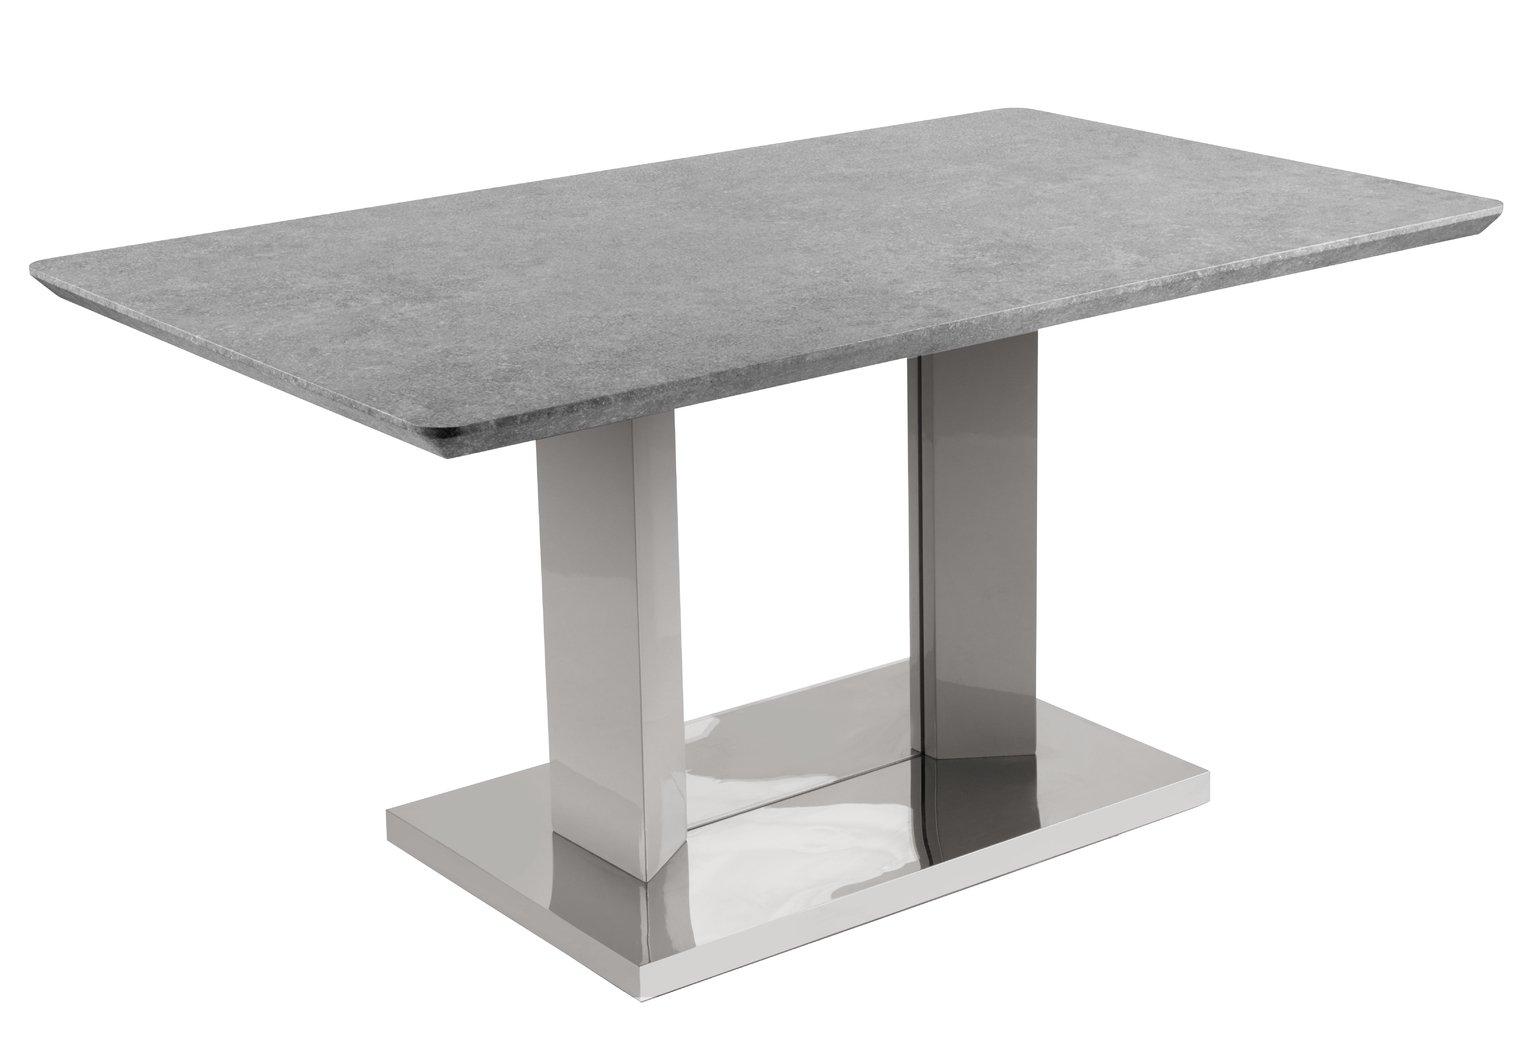 Argos Home Dalston Granite Effect Pedestal Dining Table